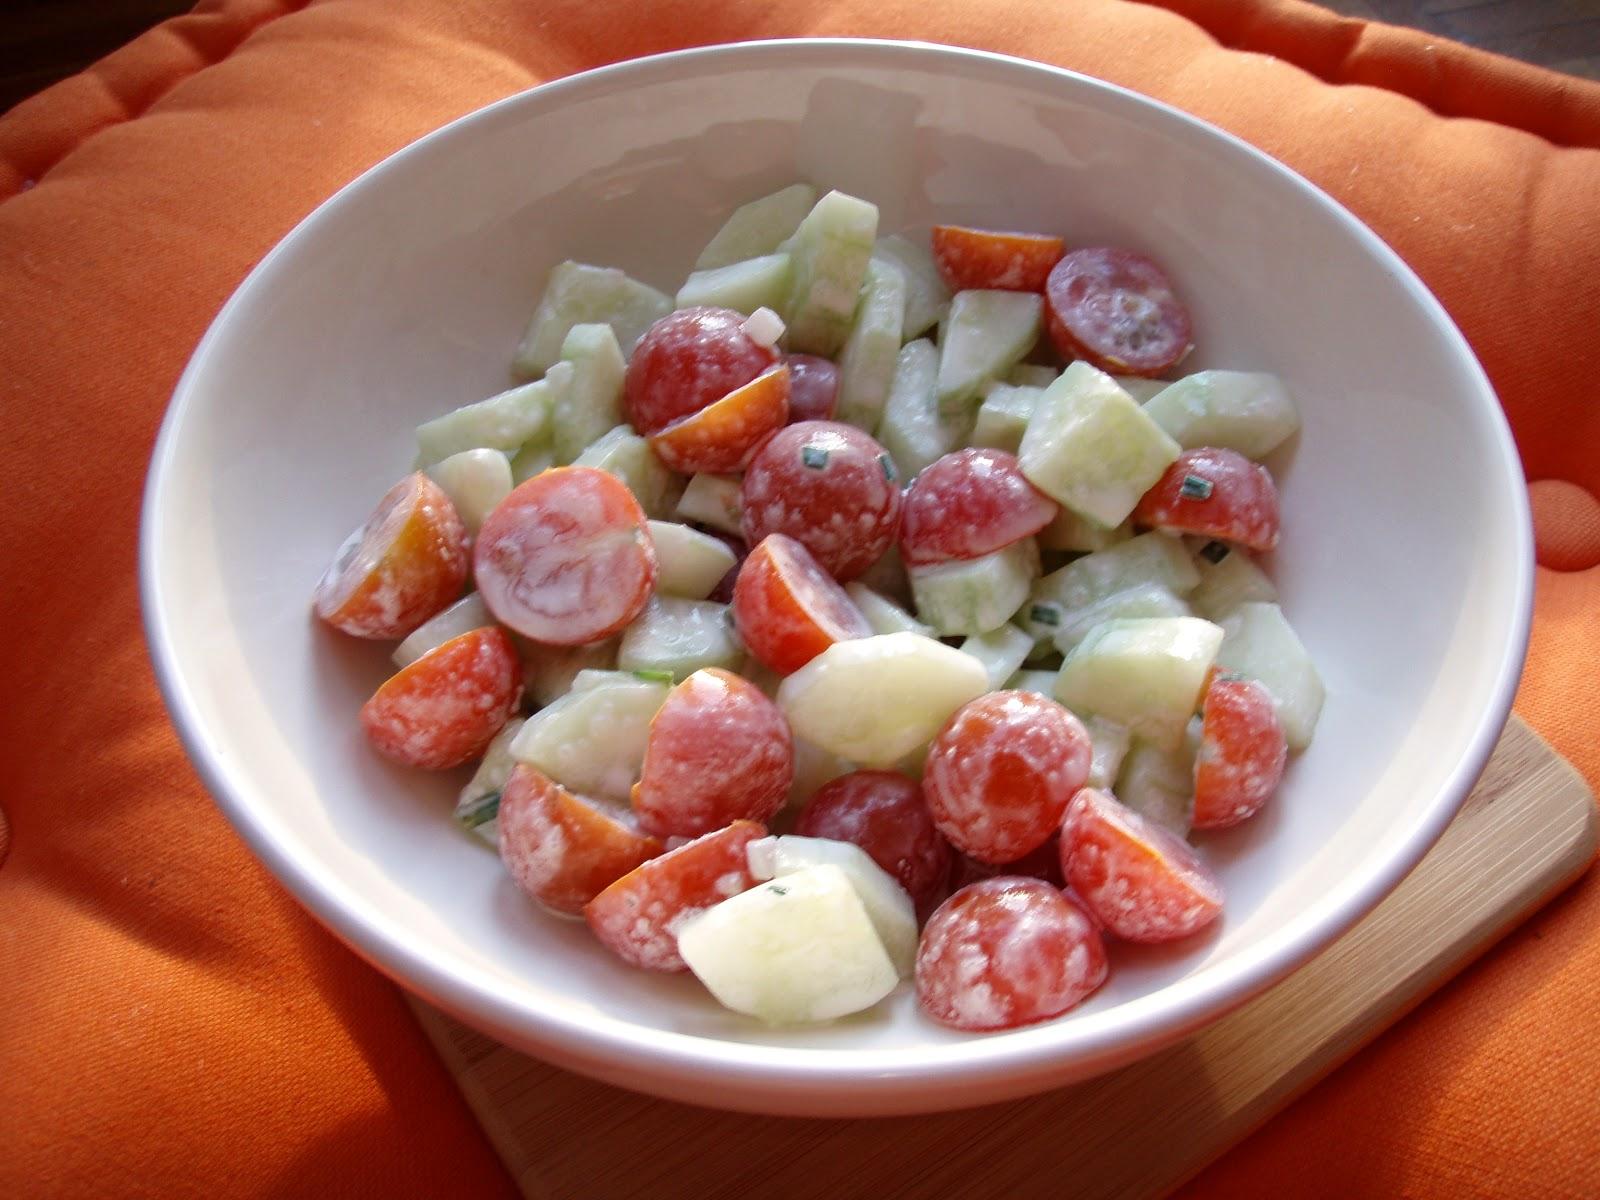 beautycareandvlogs recette healthy food salade tomates concombres. Black Bedroom Furniture Sets. Home Design Ideas